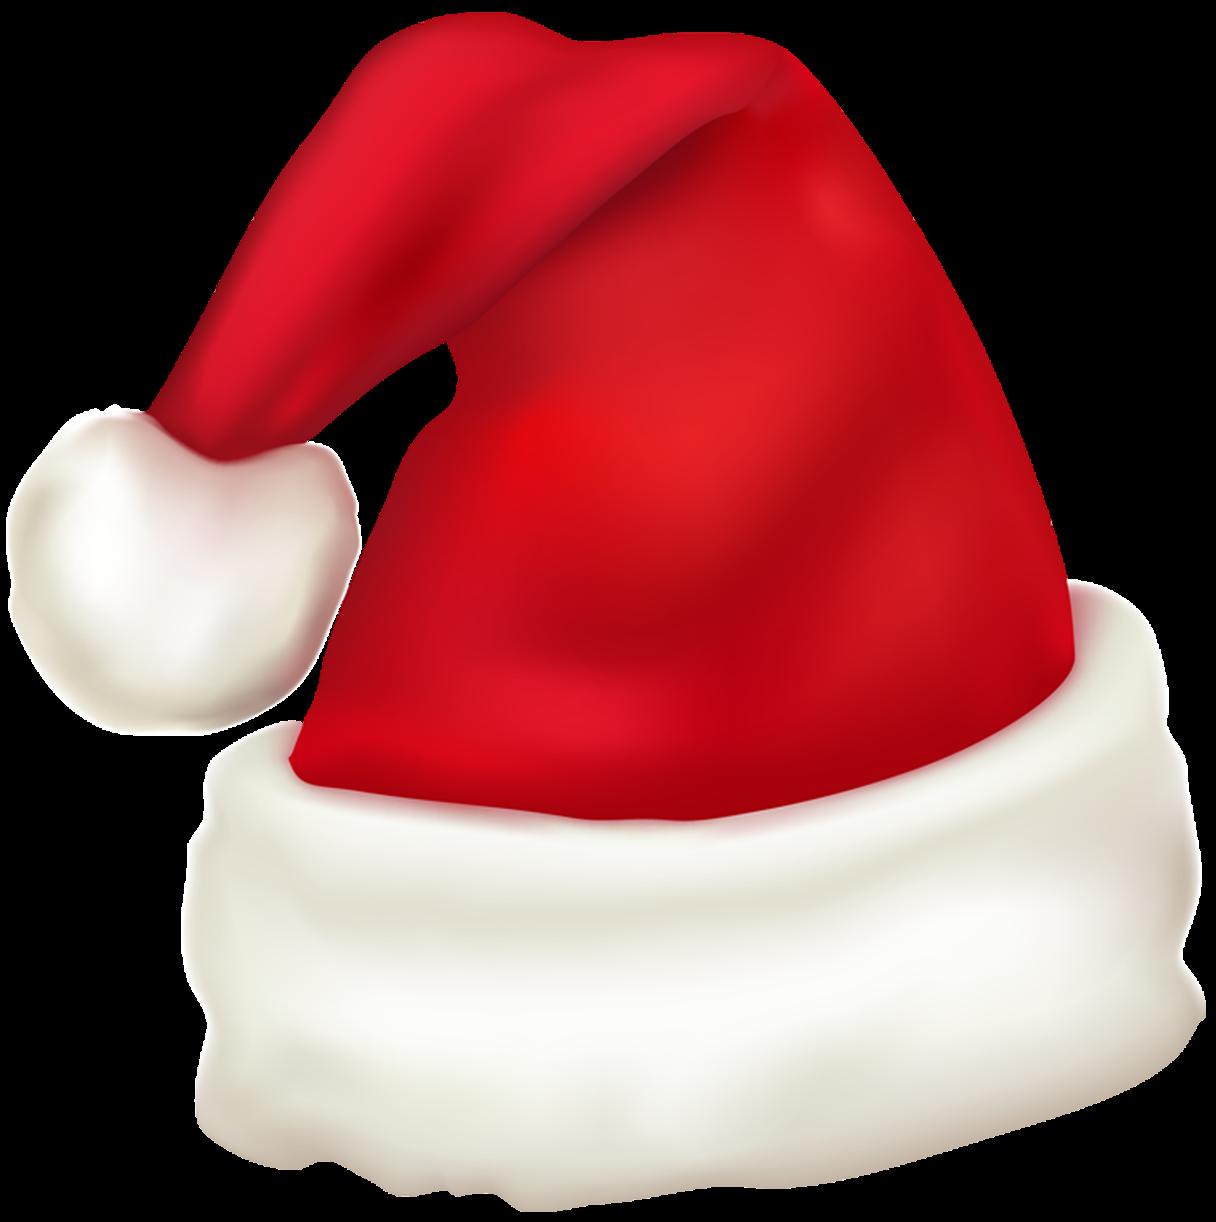 December clipart december 2016, December december 2016.